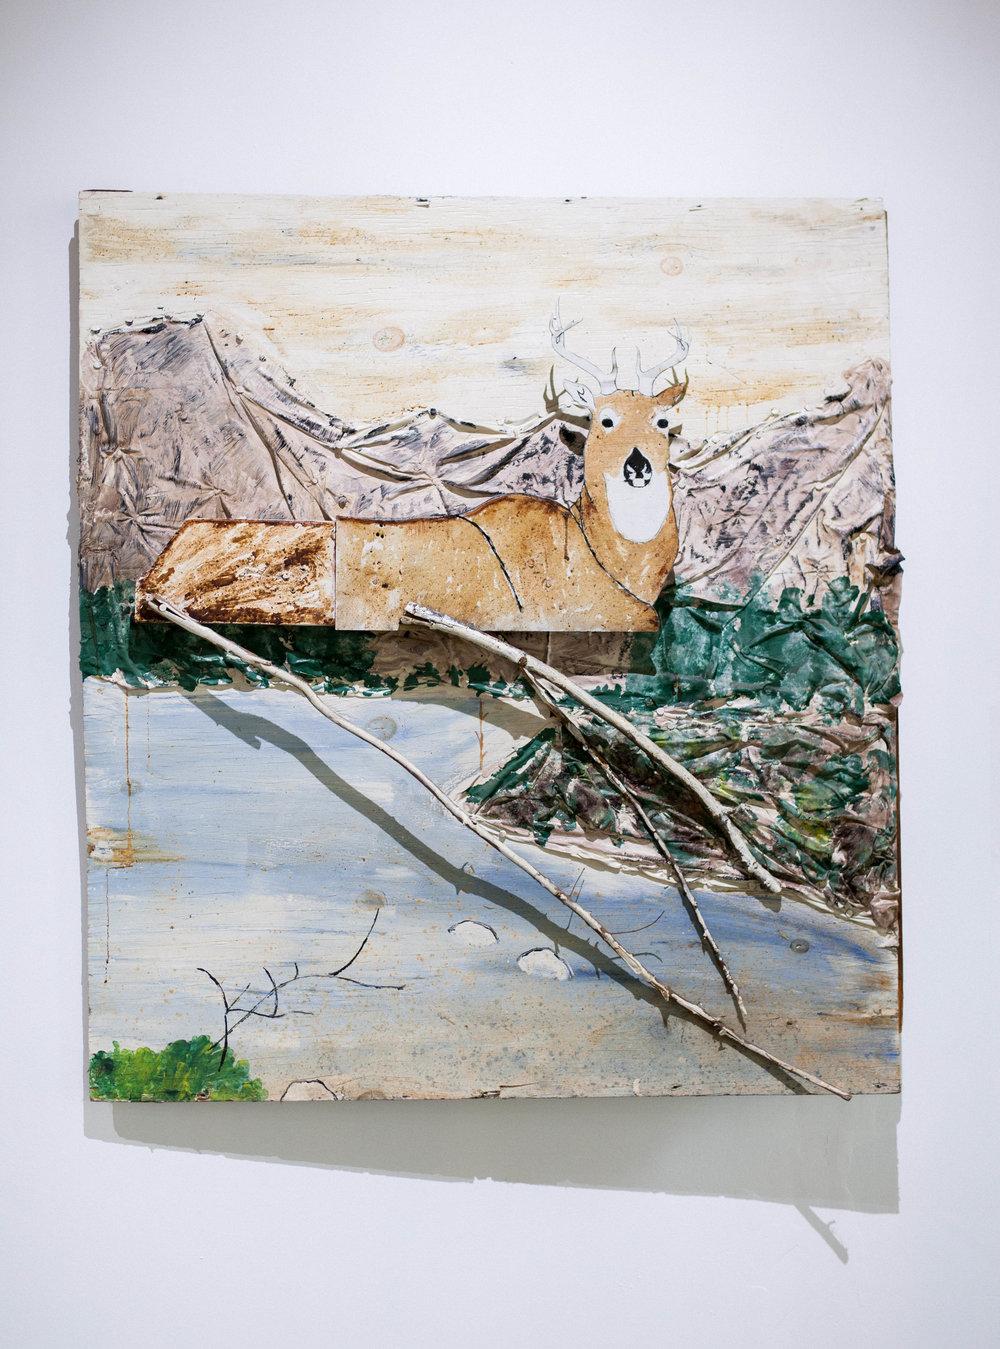 Traps - Ronald Lockett